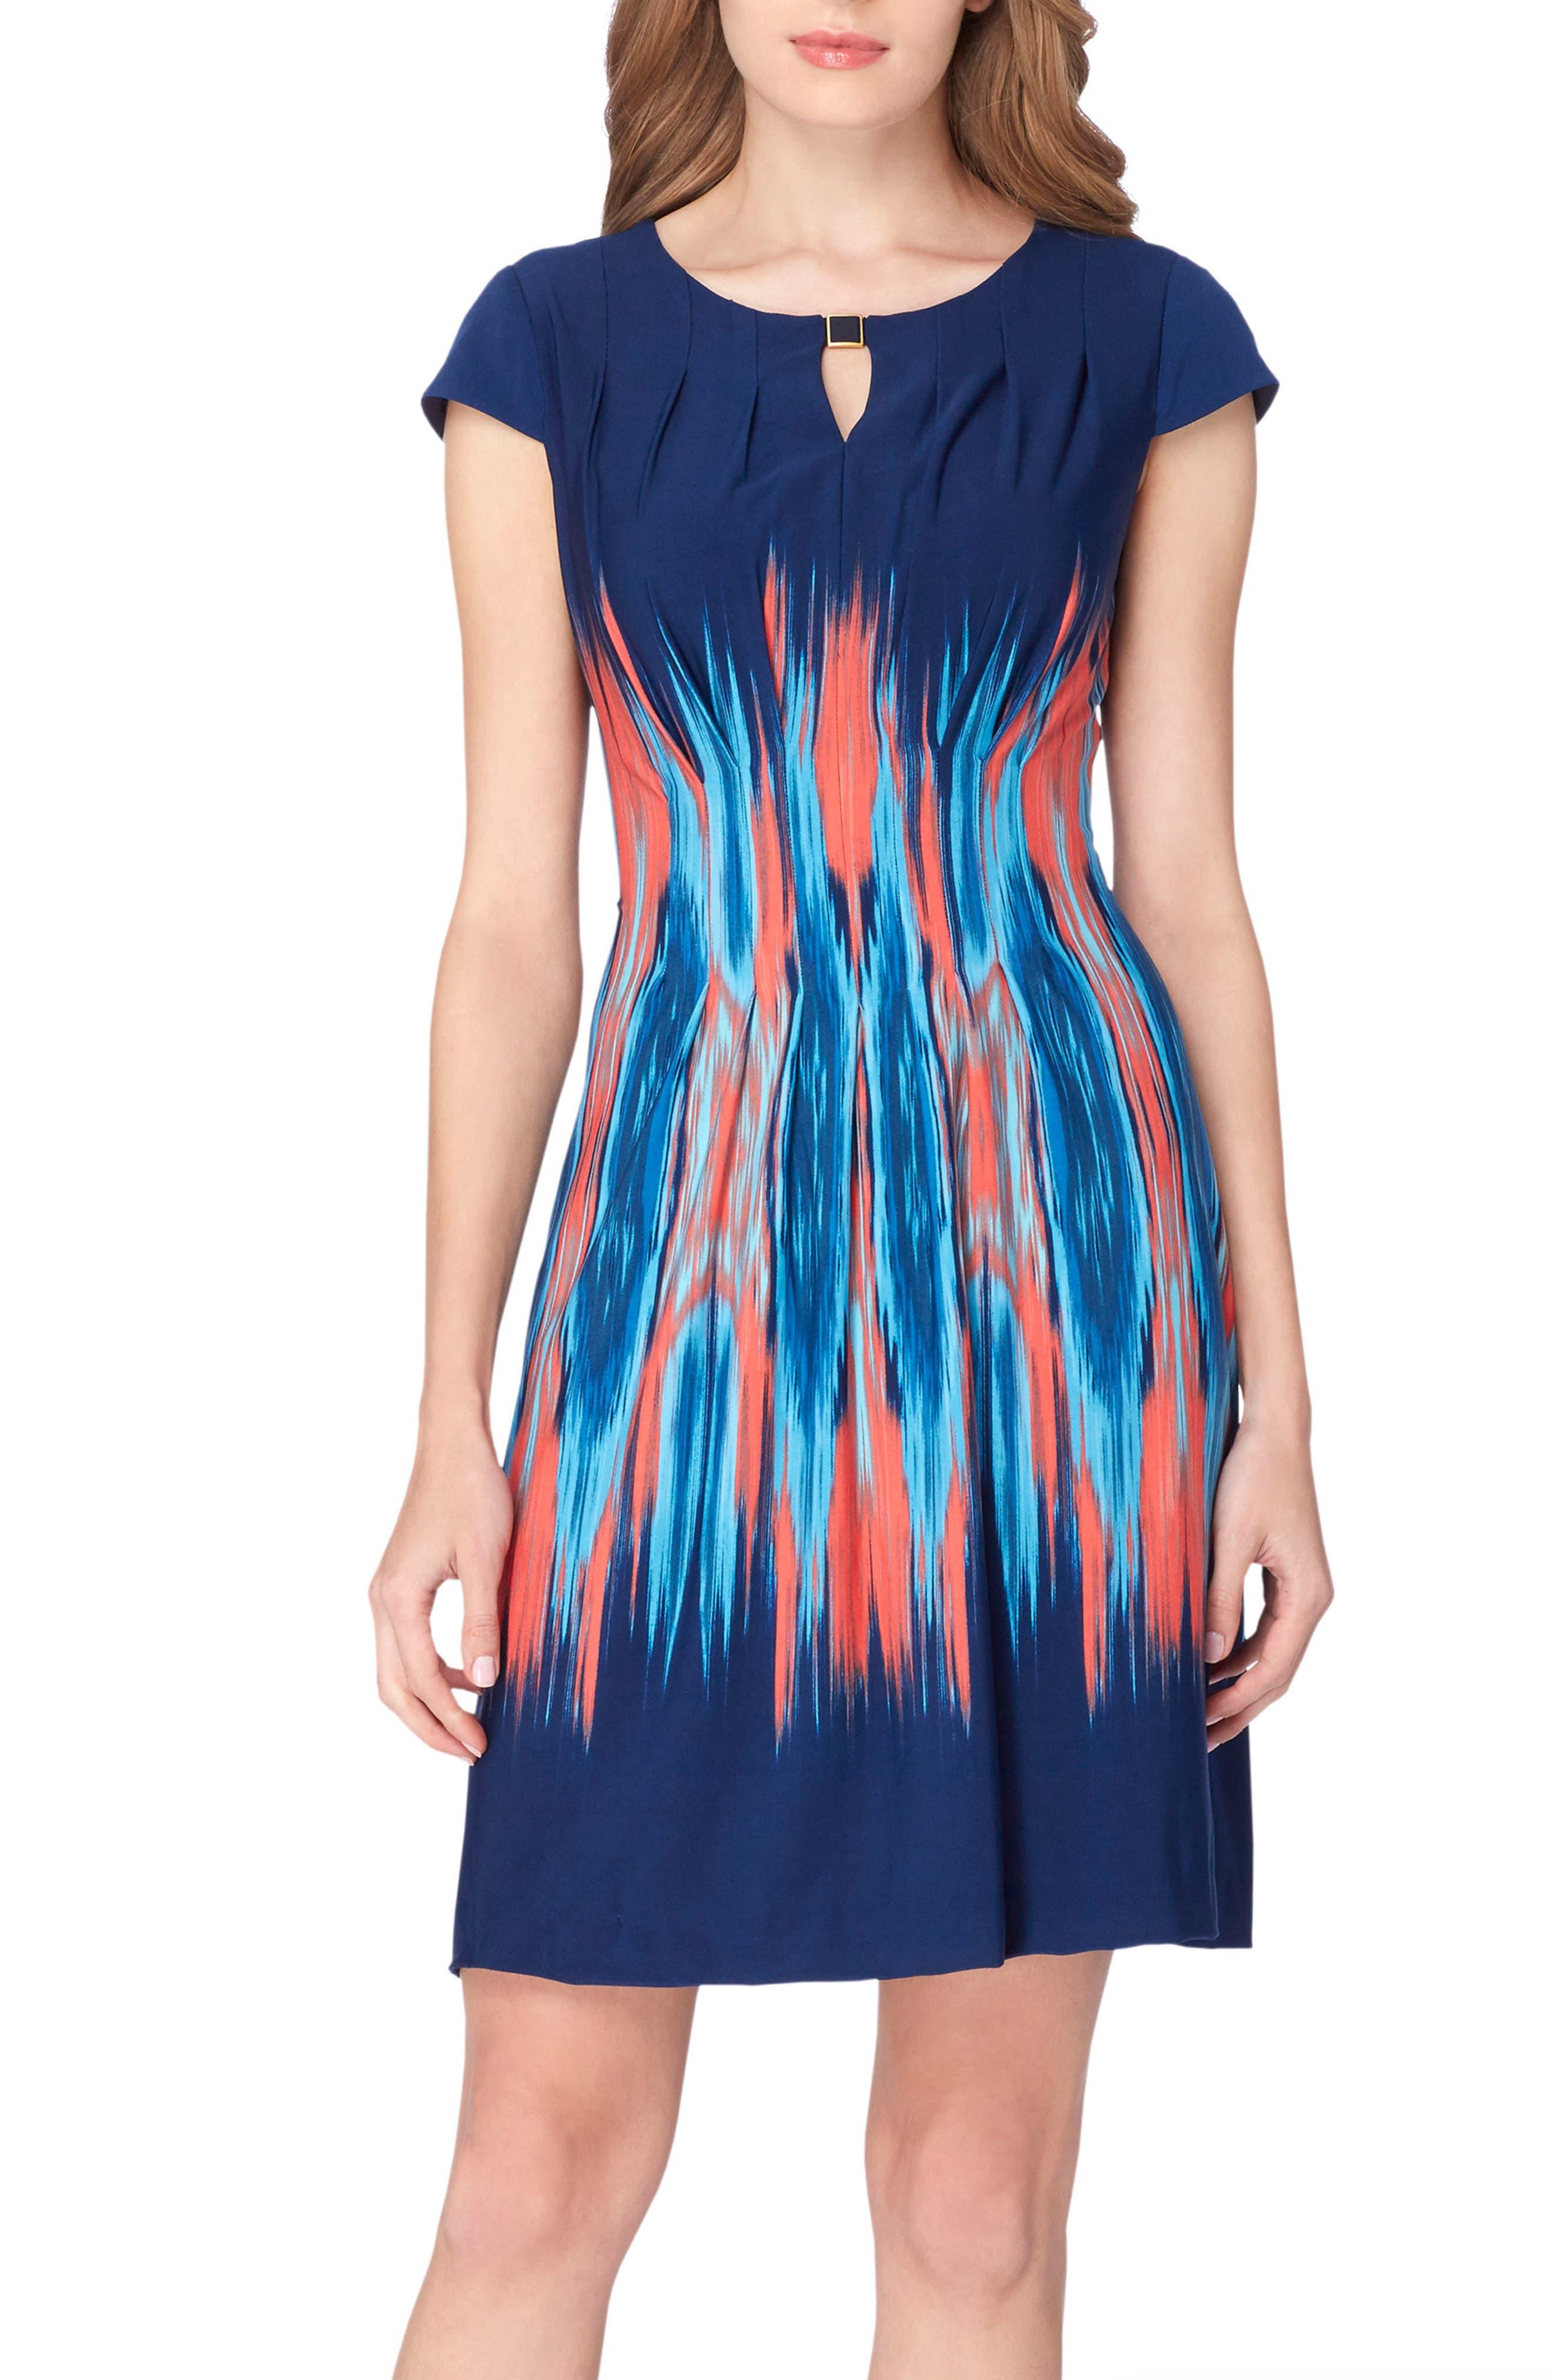 Main Image - Tahari Flame Print Jersey Sheath Dress (Regular & Petite)